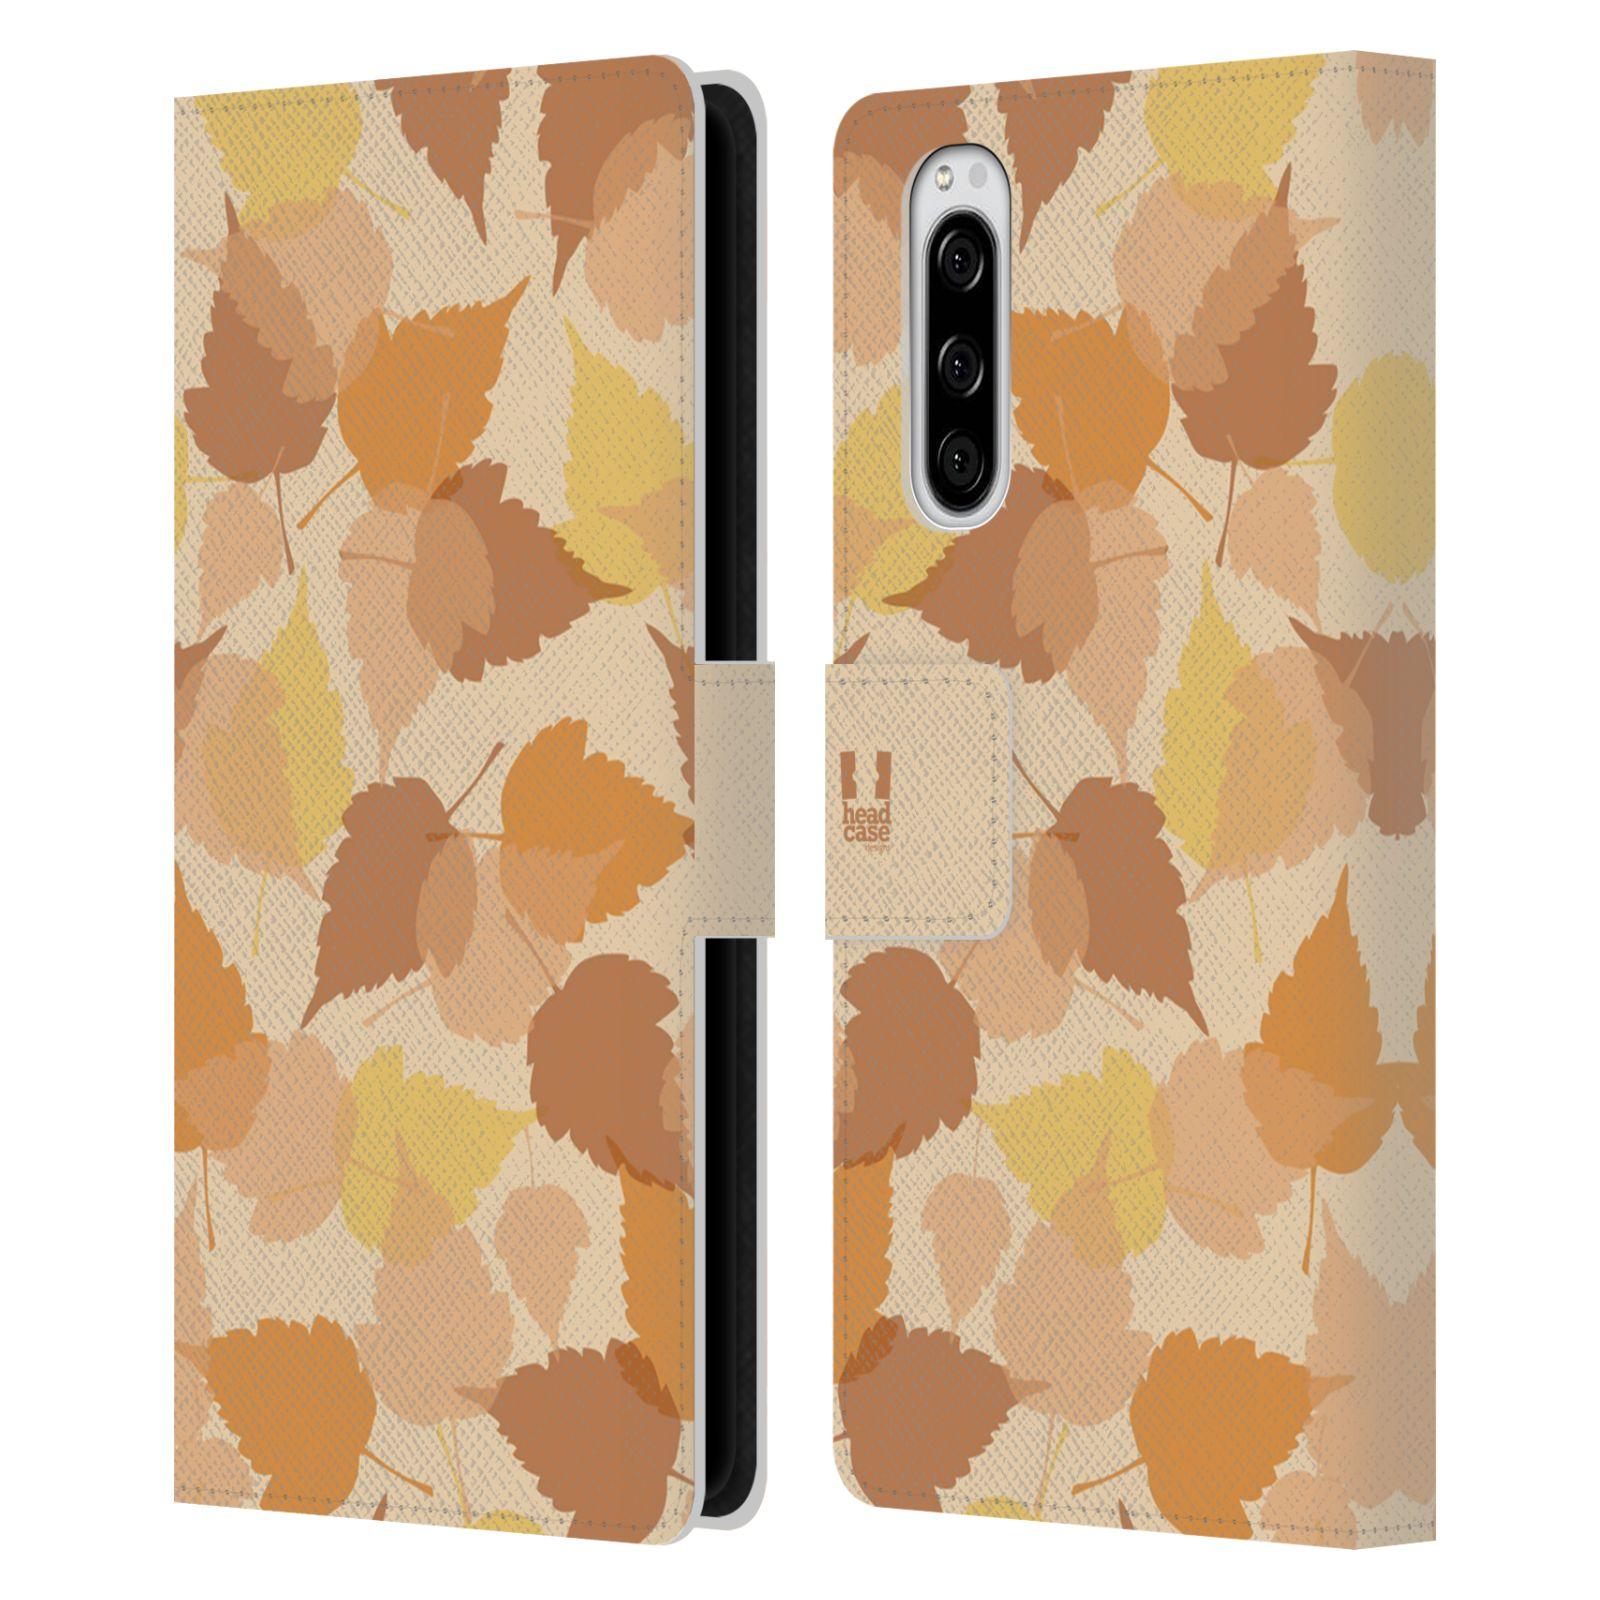 Pouzdro na mobil Sony Xperia 5 vzor prolínající se listy podzim